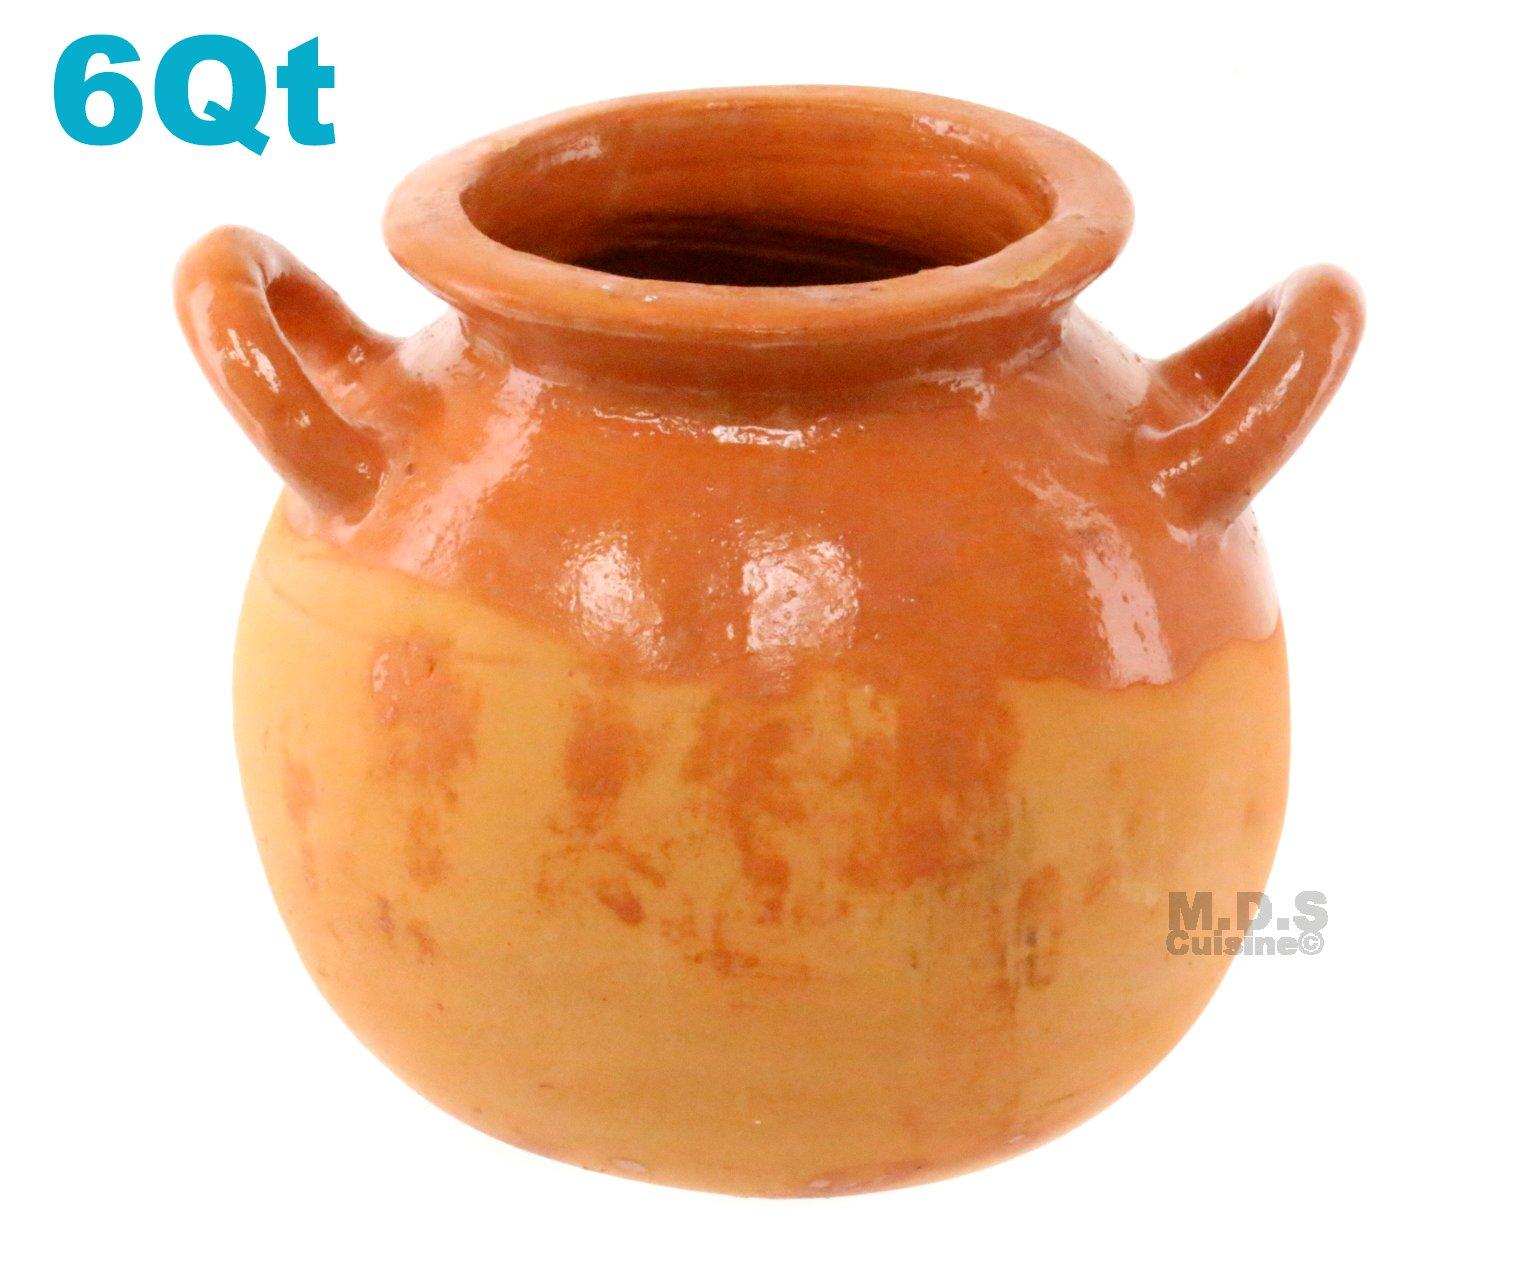 Olla De Barro Frijolera 6 Quart Cantarito Pot Traditional Decorative Artisan Artezenia Lead Free Fishbowl